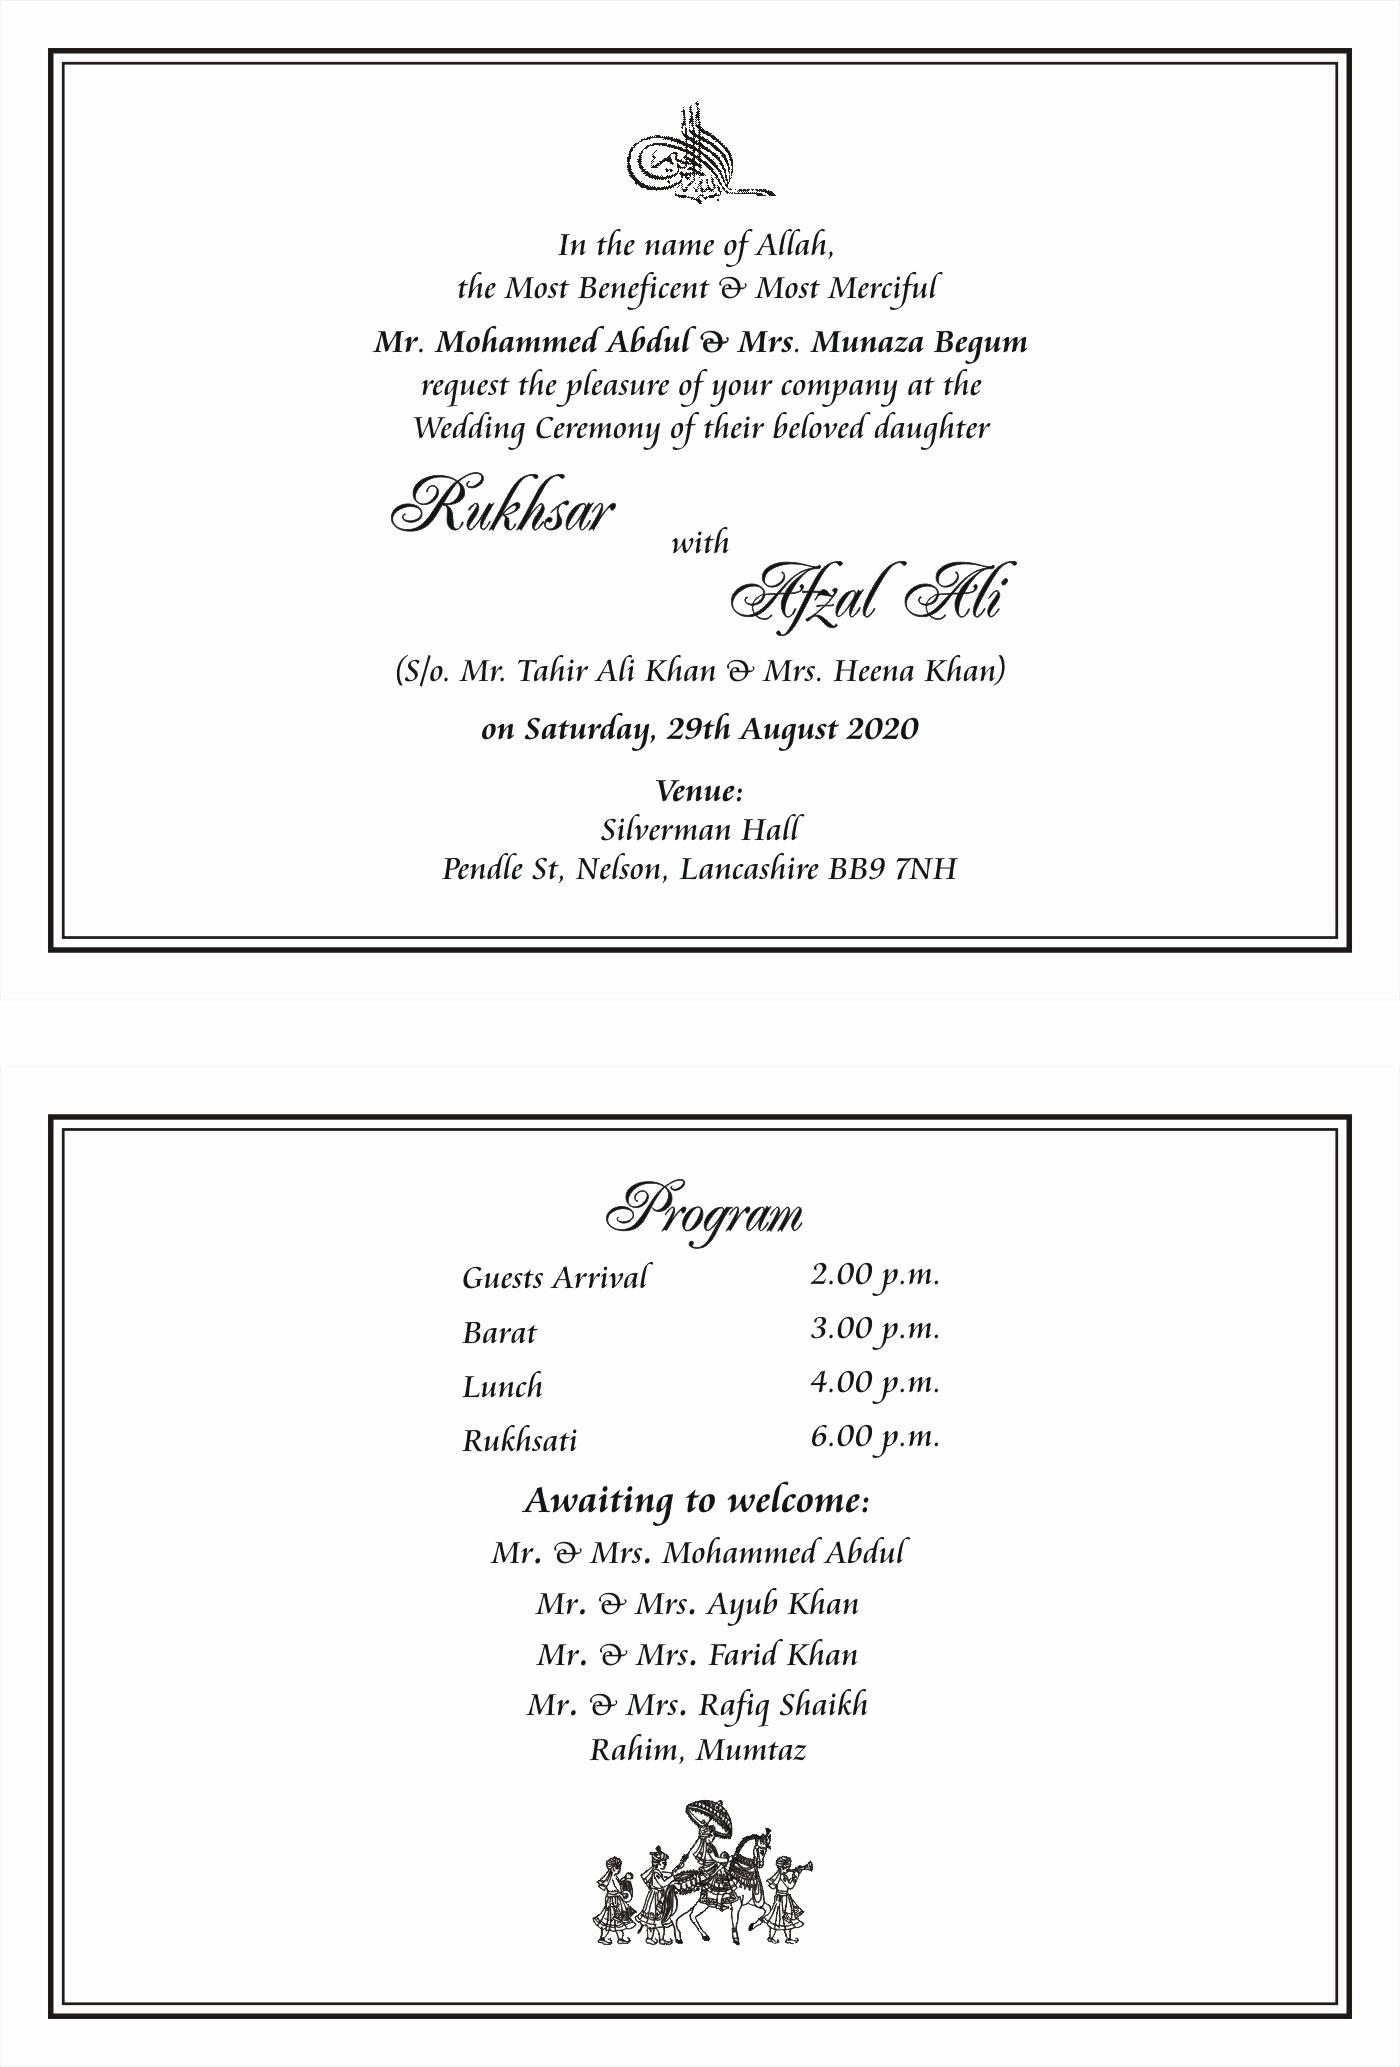 Muslim Wedding Invitation Wording Fresh Nikah Wordings for Invitation Card